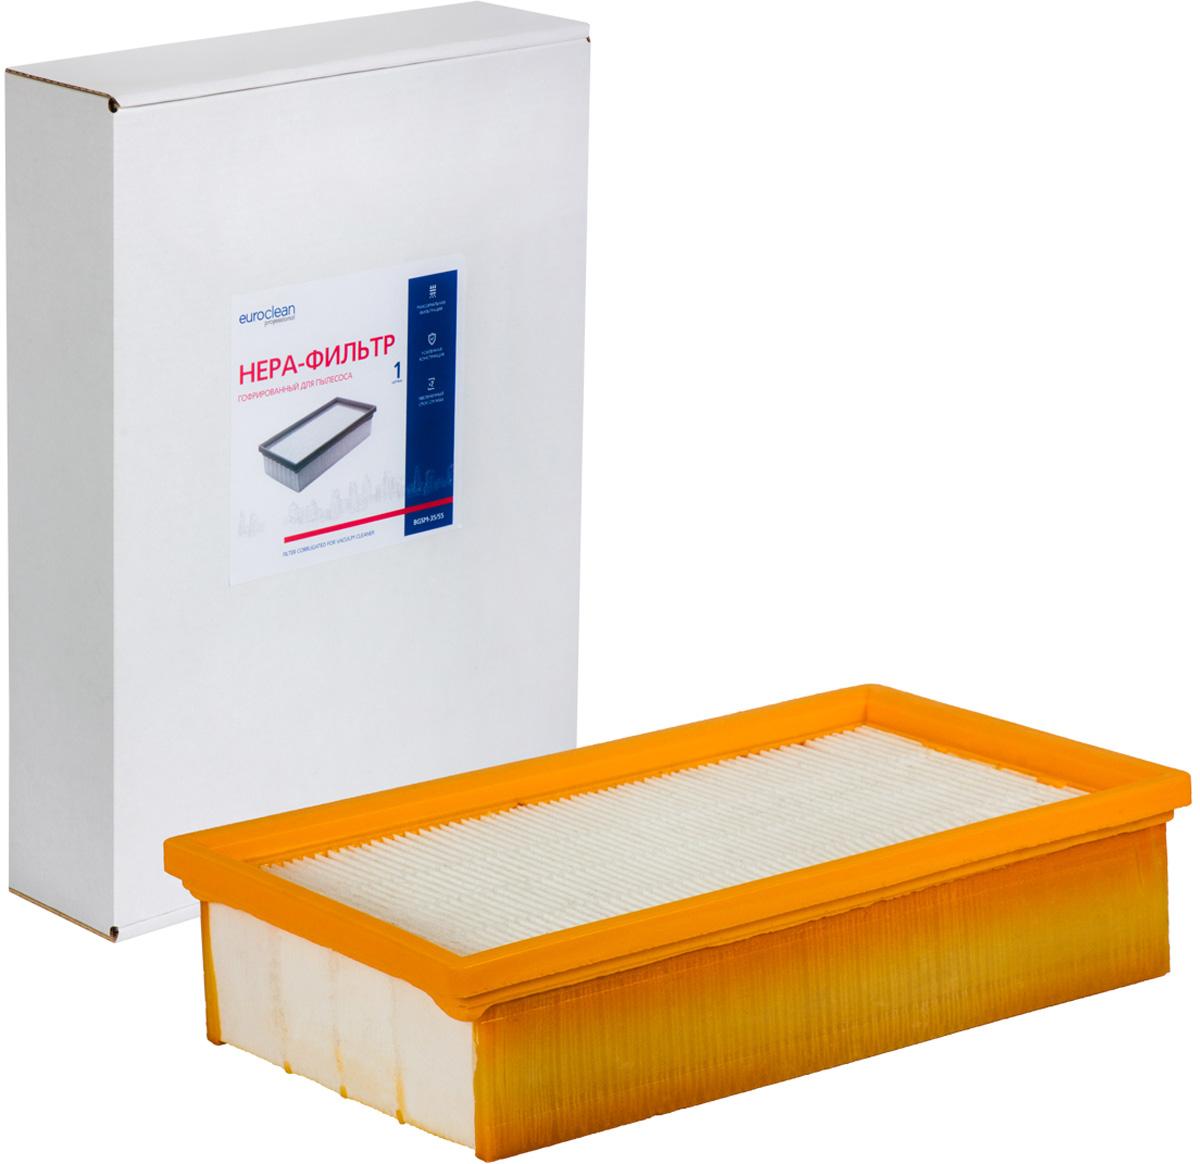 Euroclean BGSM-35/55 фильтр складчатый для пылесоса BOSCH (аналог 2 607 432 034)BGSM-35/55Фильтр складчатый для пылесоса BOSCH, 1 шт., многоразовый моющийся/полиэстер, бренд: EUROCLEAN, арт. BGSM-35/55, код. 2 607 432 034